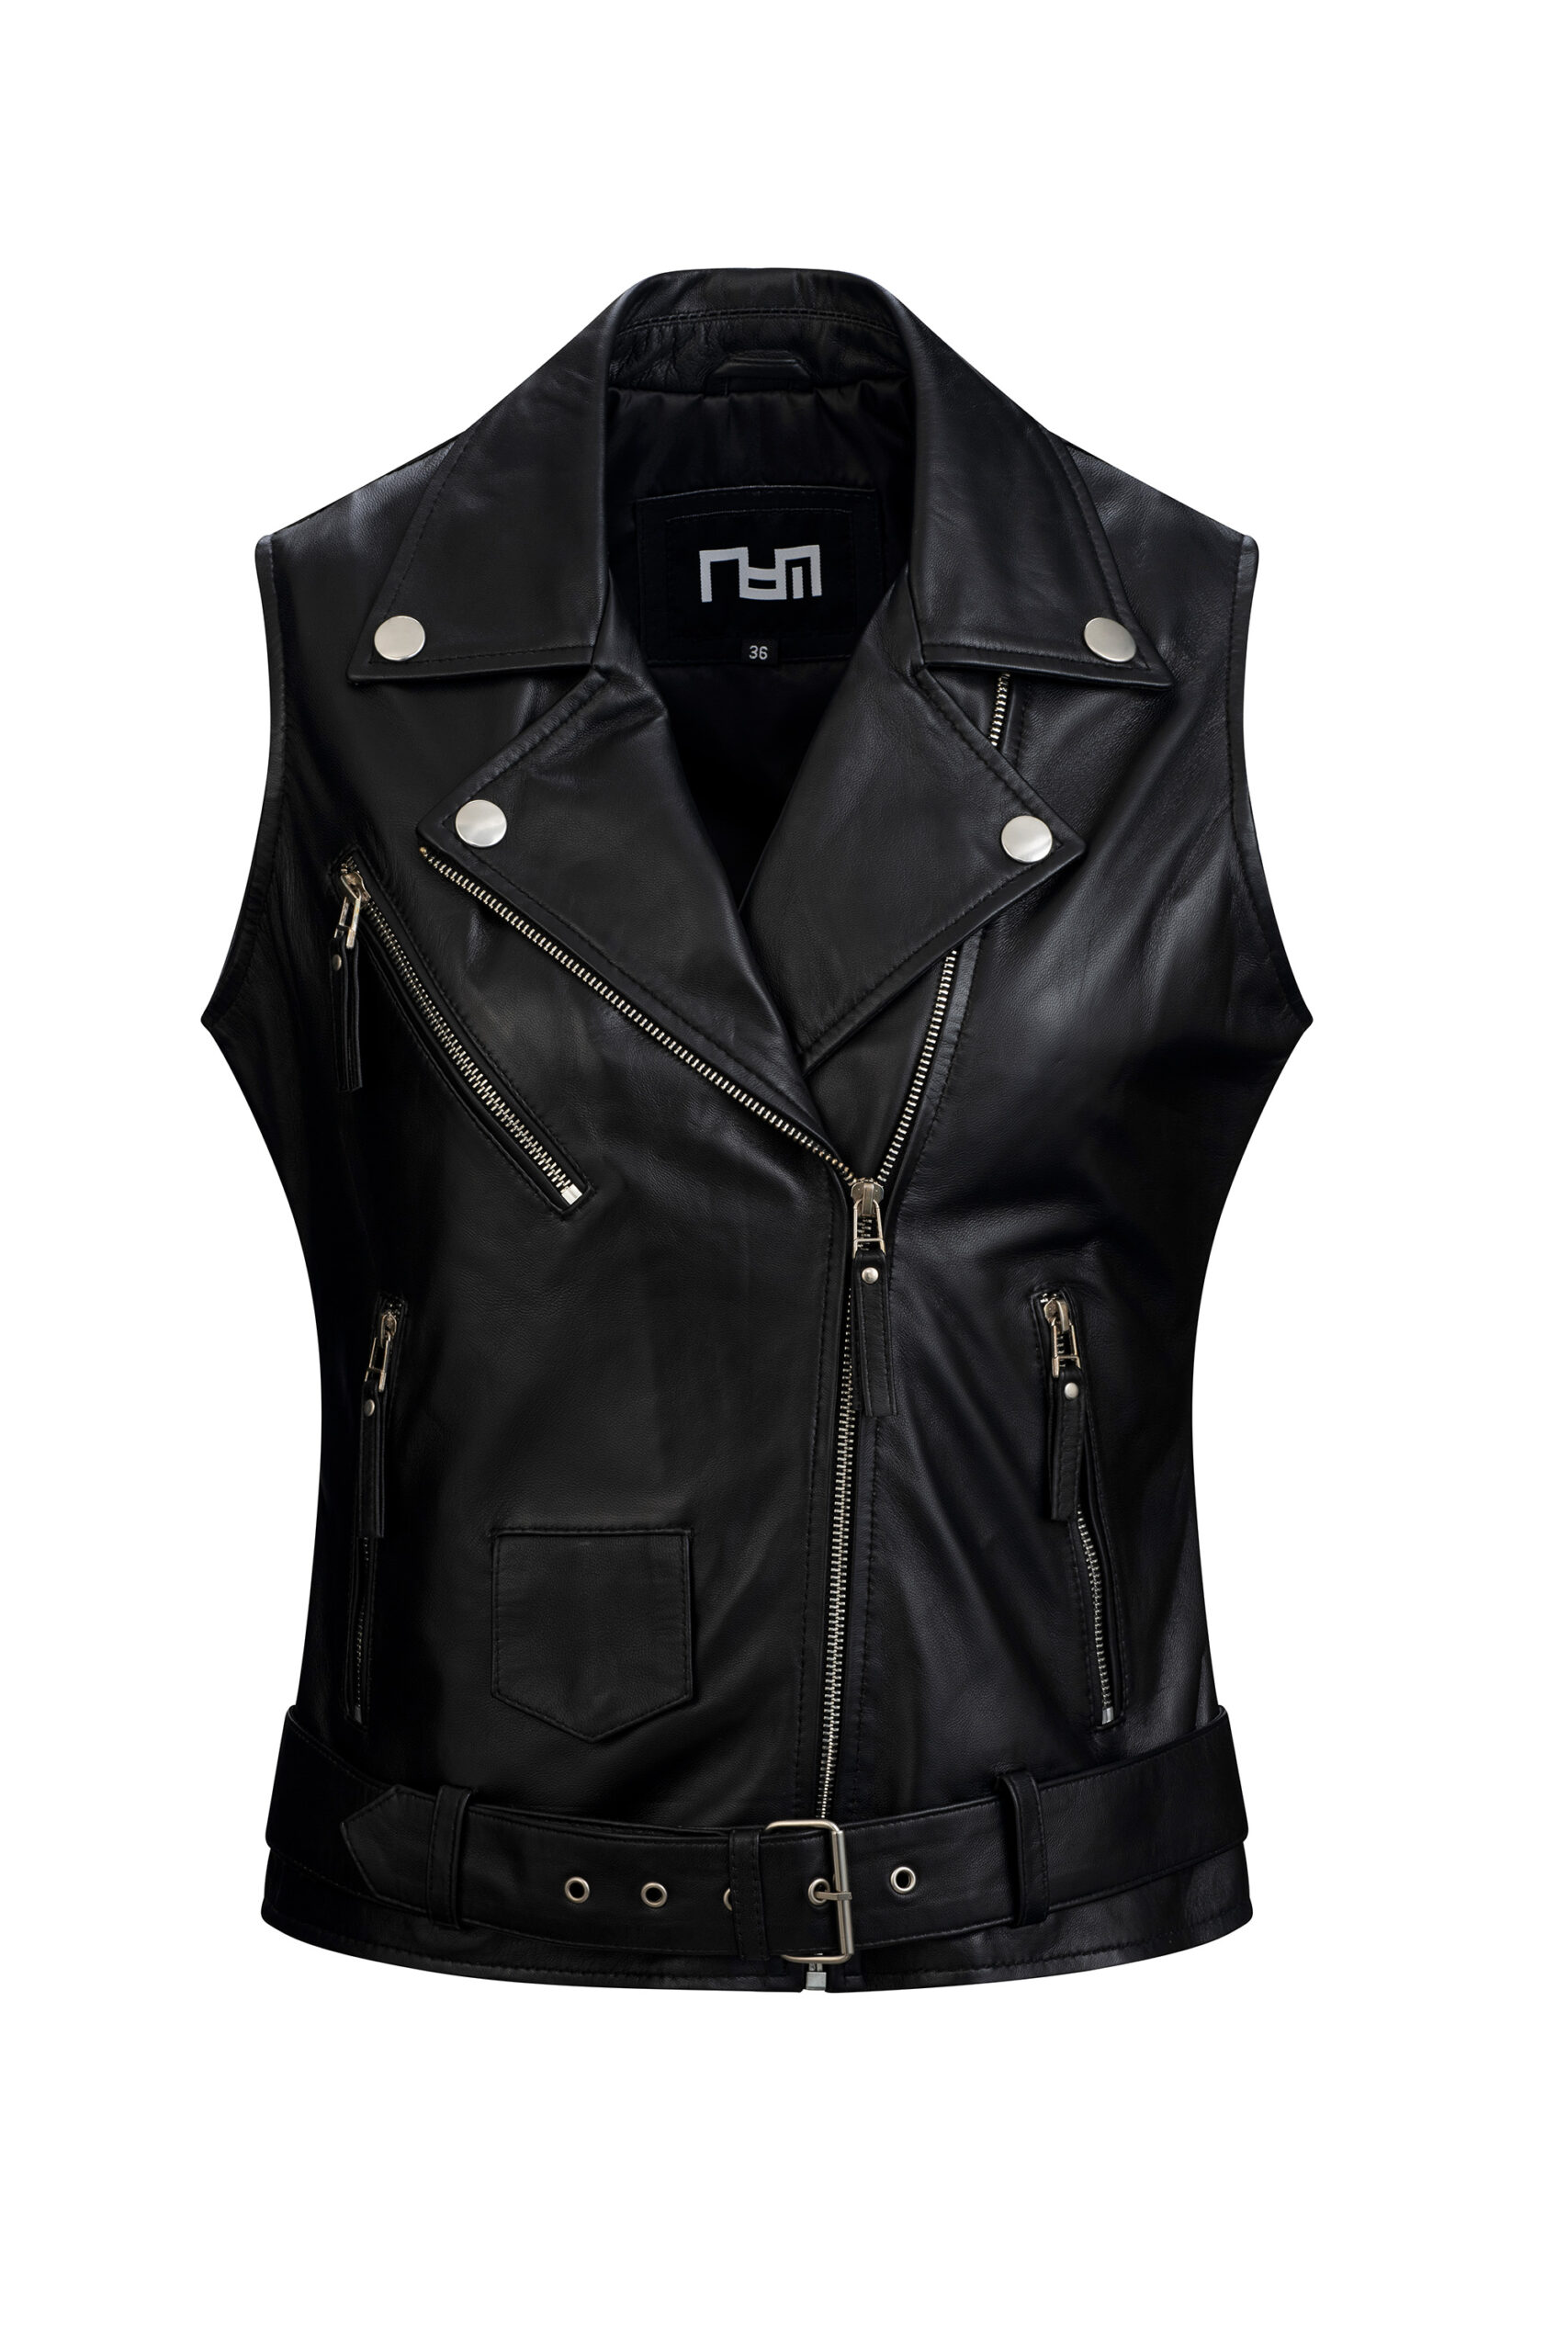 L165 bodywarmer dames zwart